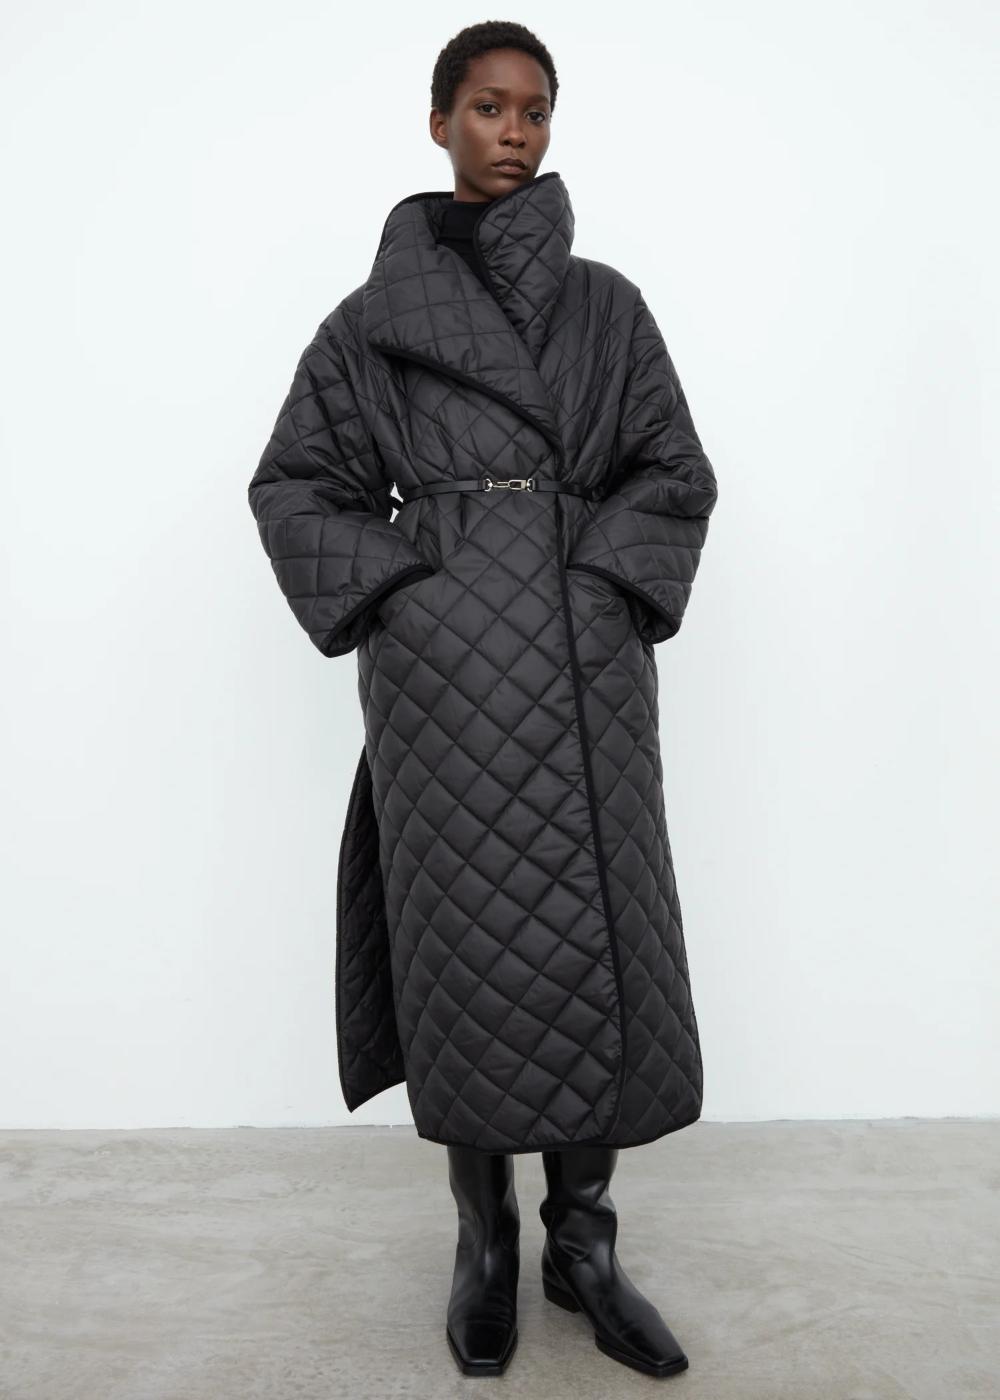 Annecy Quilted Coat Quilted Coat Quilted Coat Outfit Long Quilted Coat [ 1400 x 1000 Pixel ]